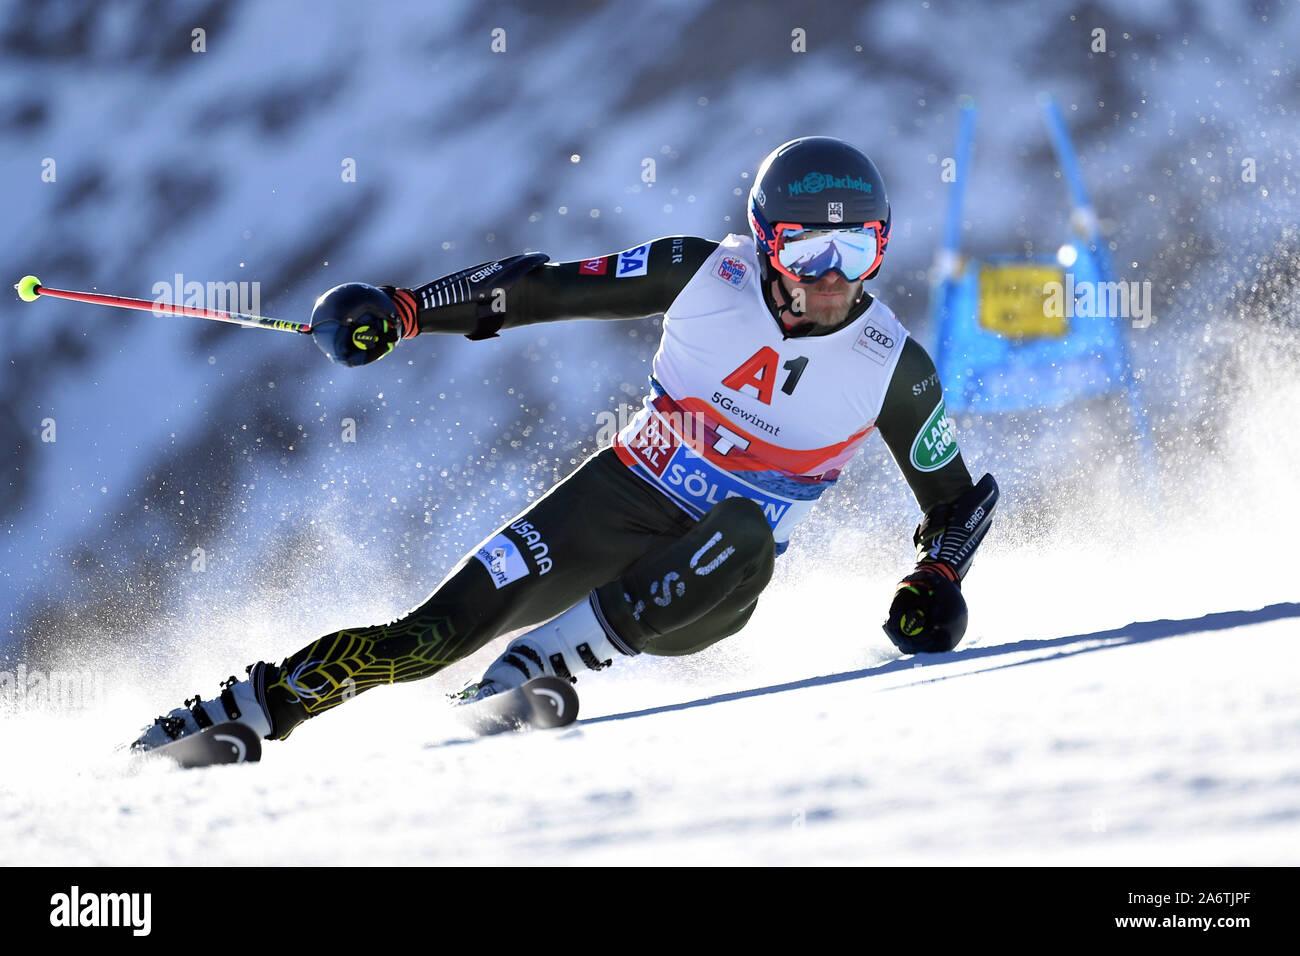 Tommy Ford Usa Action Men S Giant Slalom Men S Giant Slalom Alpine Skiing World Cup In Soelden On The Rettenbachferner Rettenbach Glacier Season 2019 2020 19 20 On 27 10 2019 Usage Worldwide Stock Photo Alamy